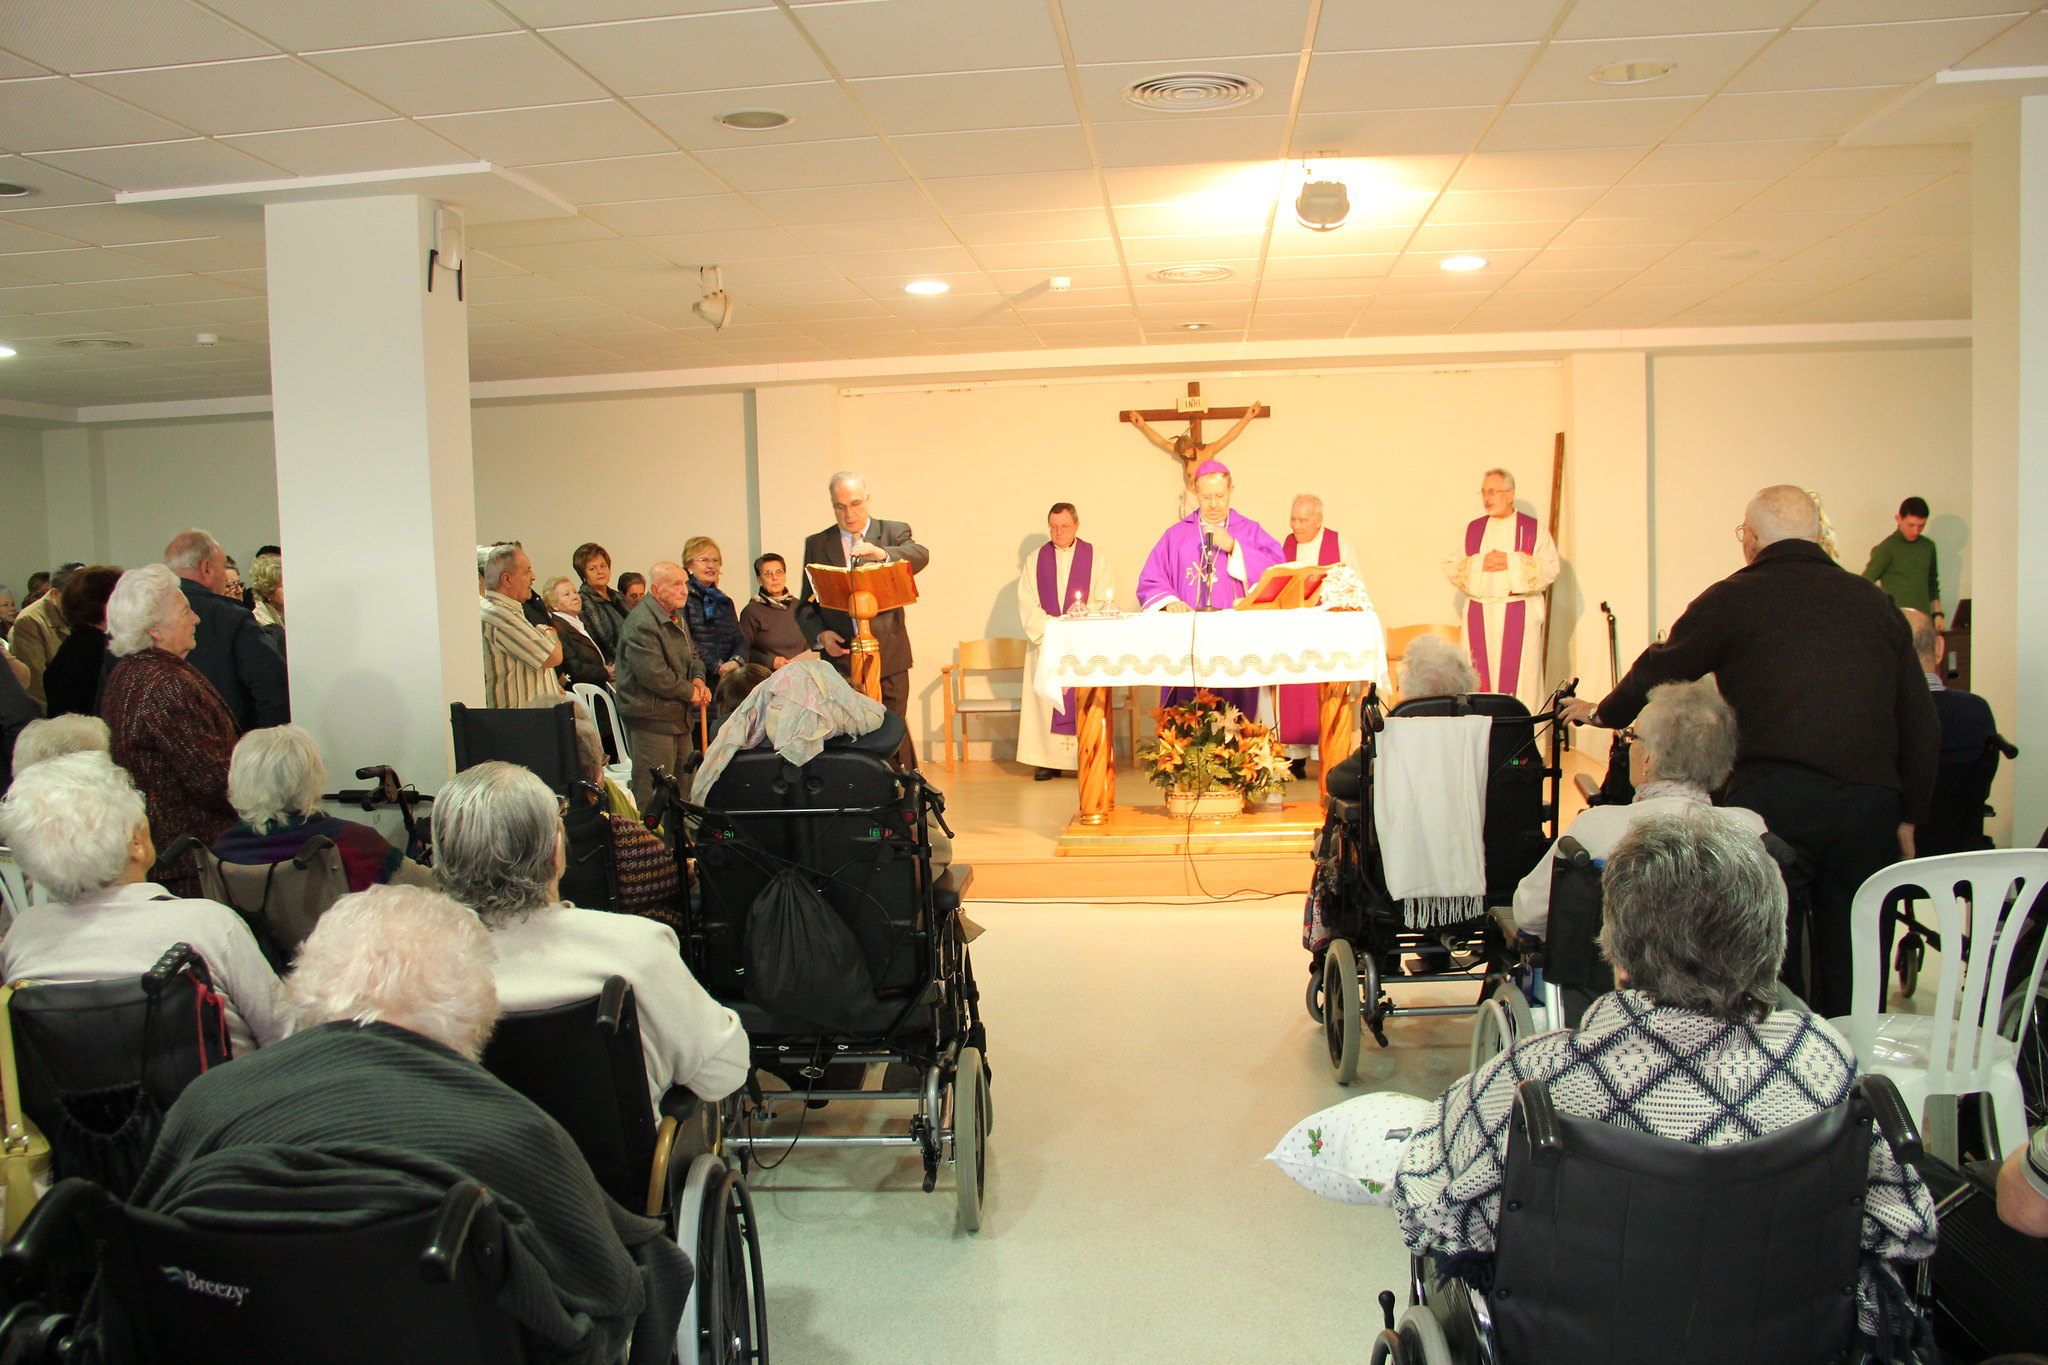 (2016-02-13) - Inauguración Virgen De Lourdes, La Molineta - Archivo La Molineta (022)